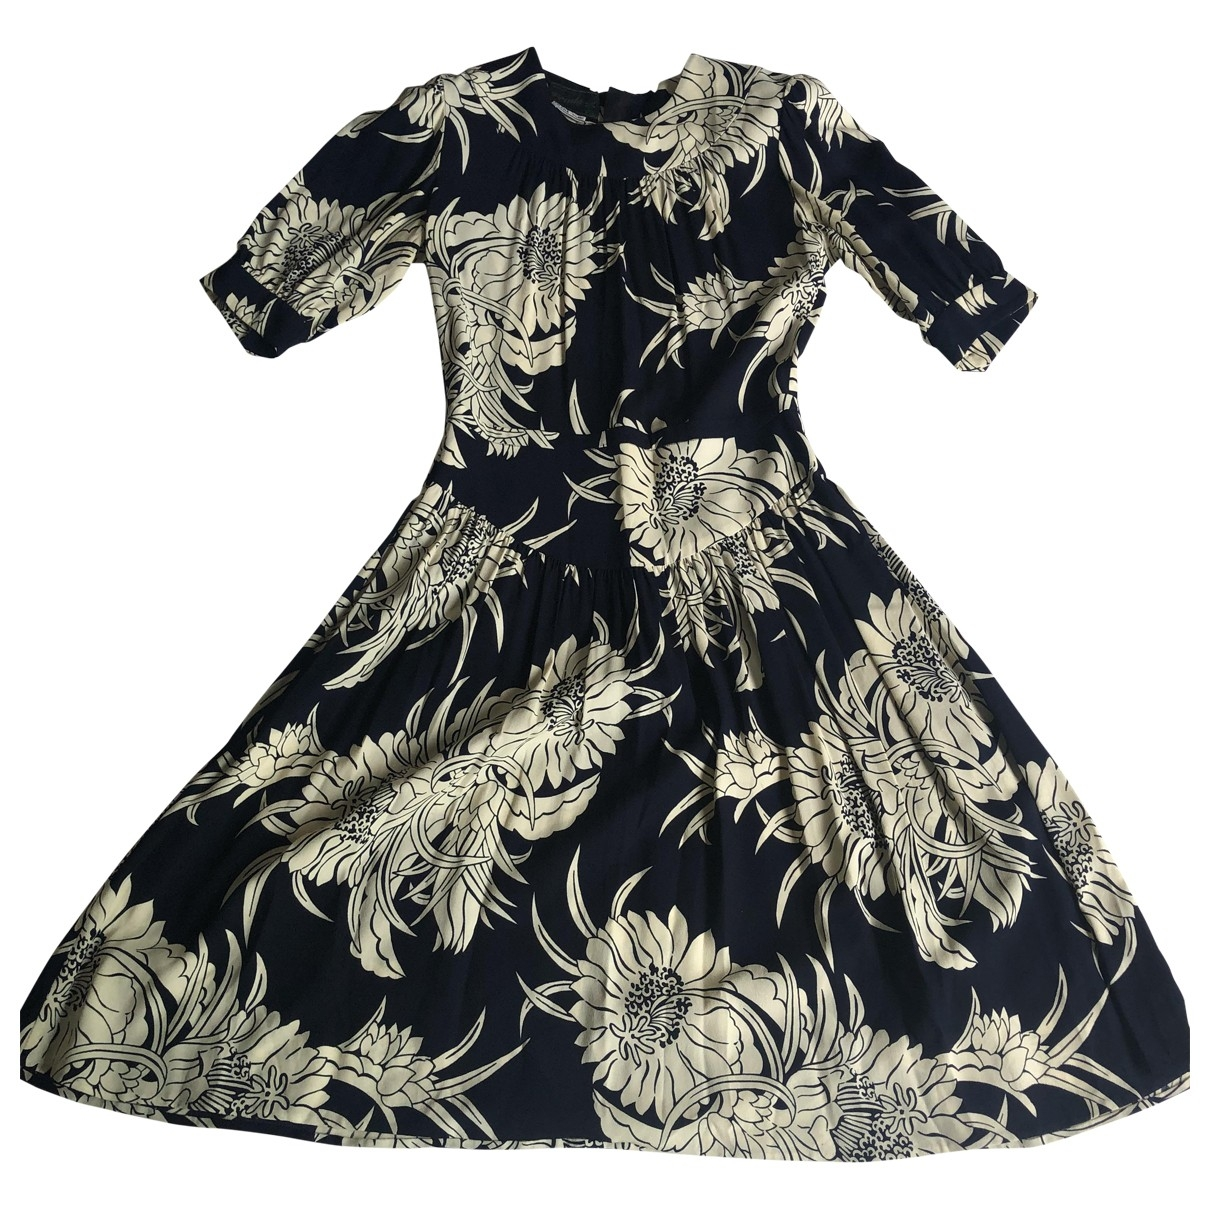 Prada \N Silk dress for Women 38 IT